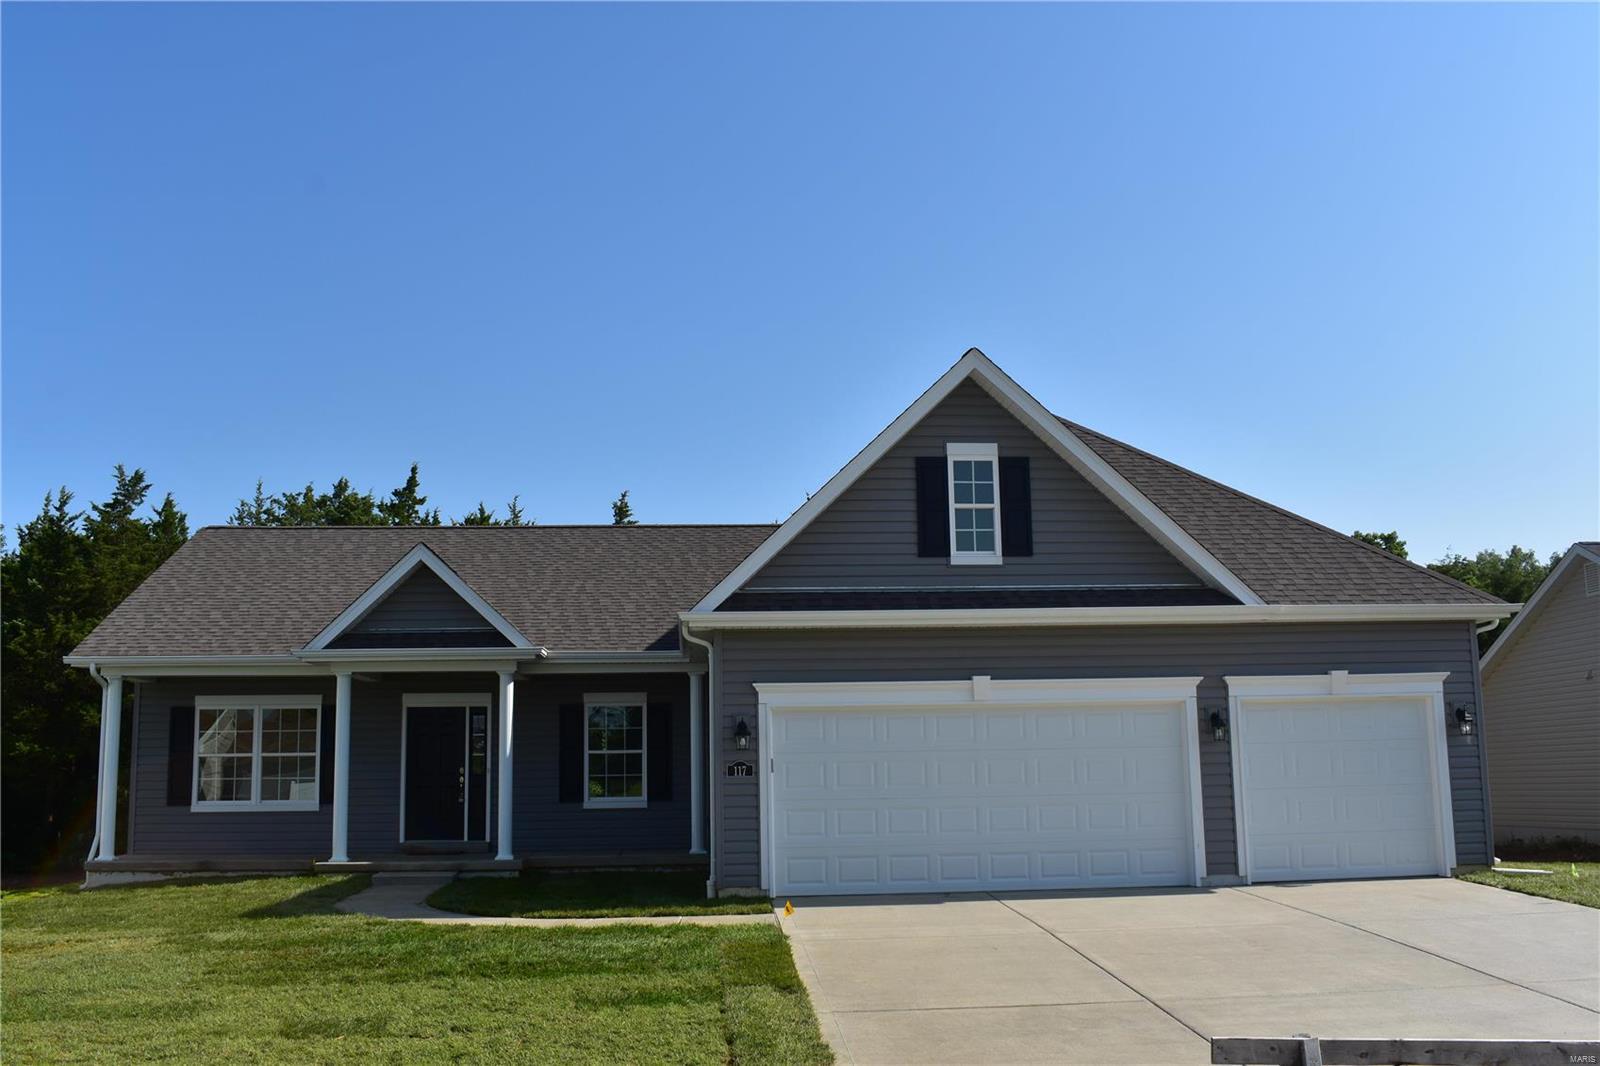 311 TBB-Lot 49 Carolyn Circle Property Photo - Wright City, MO real estate listing